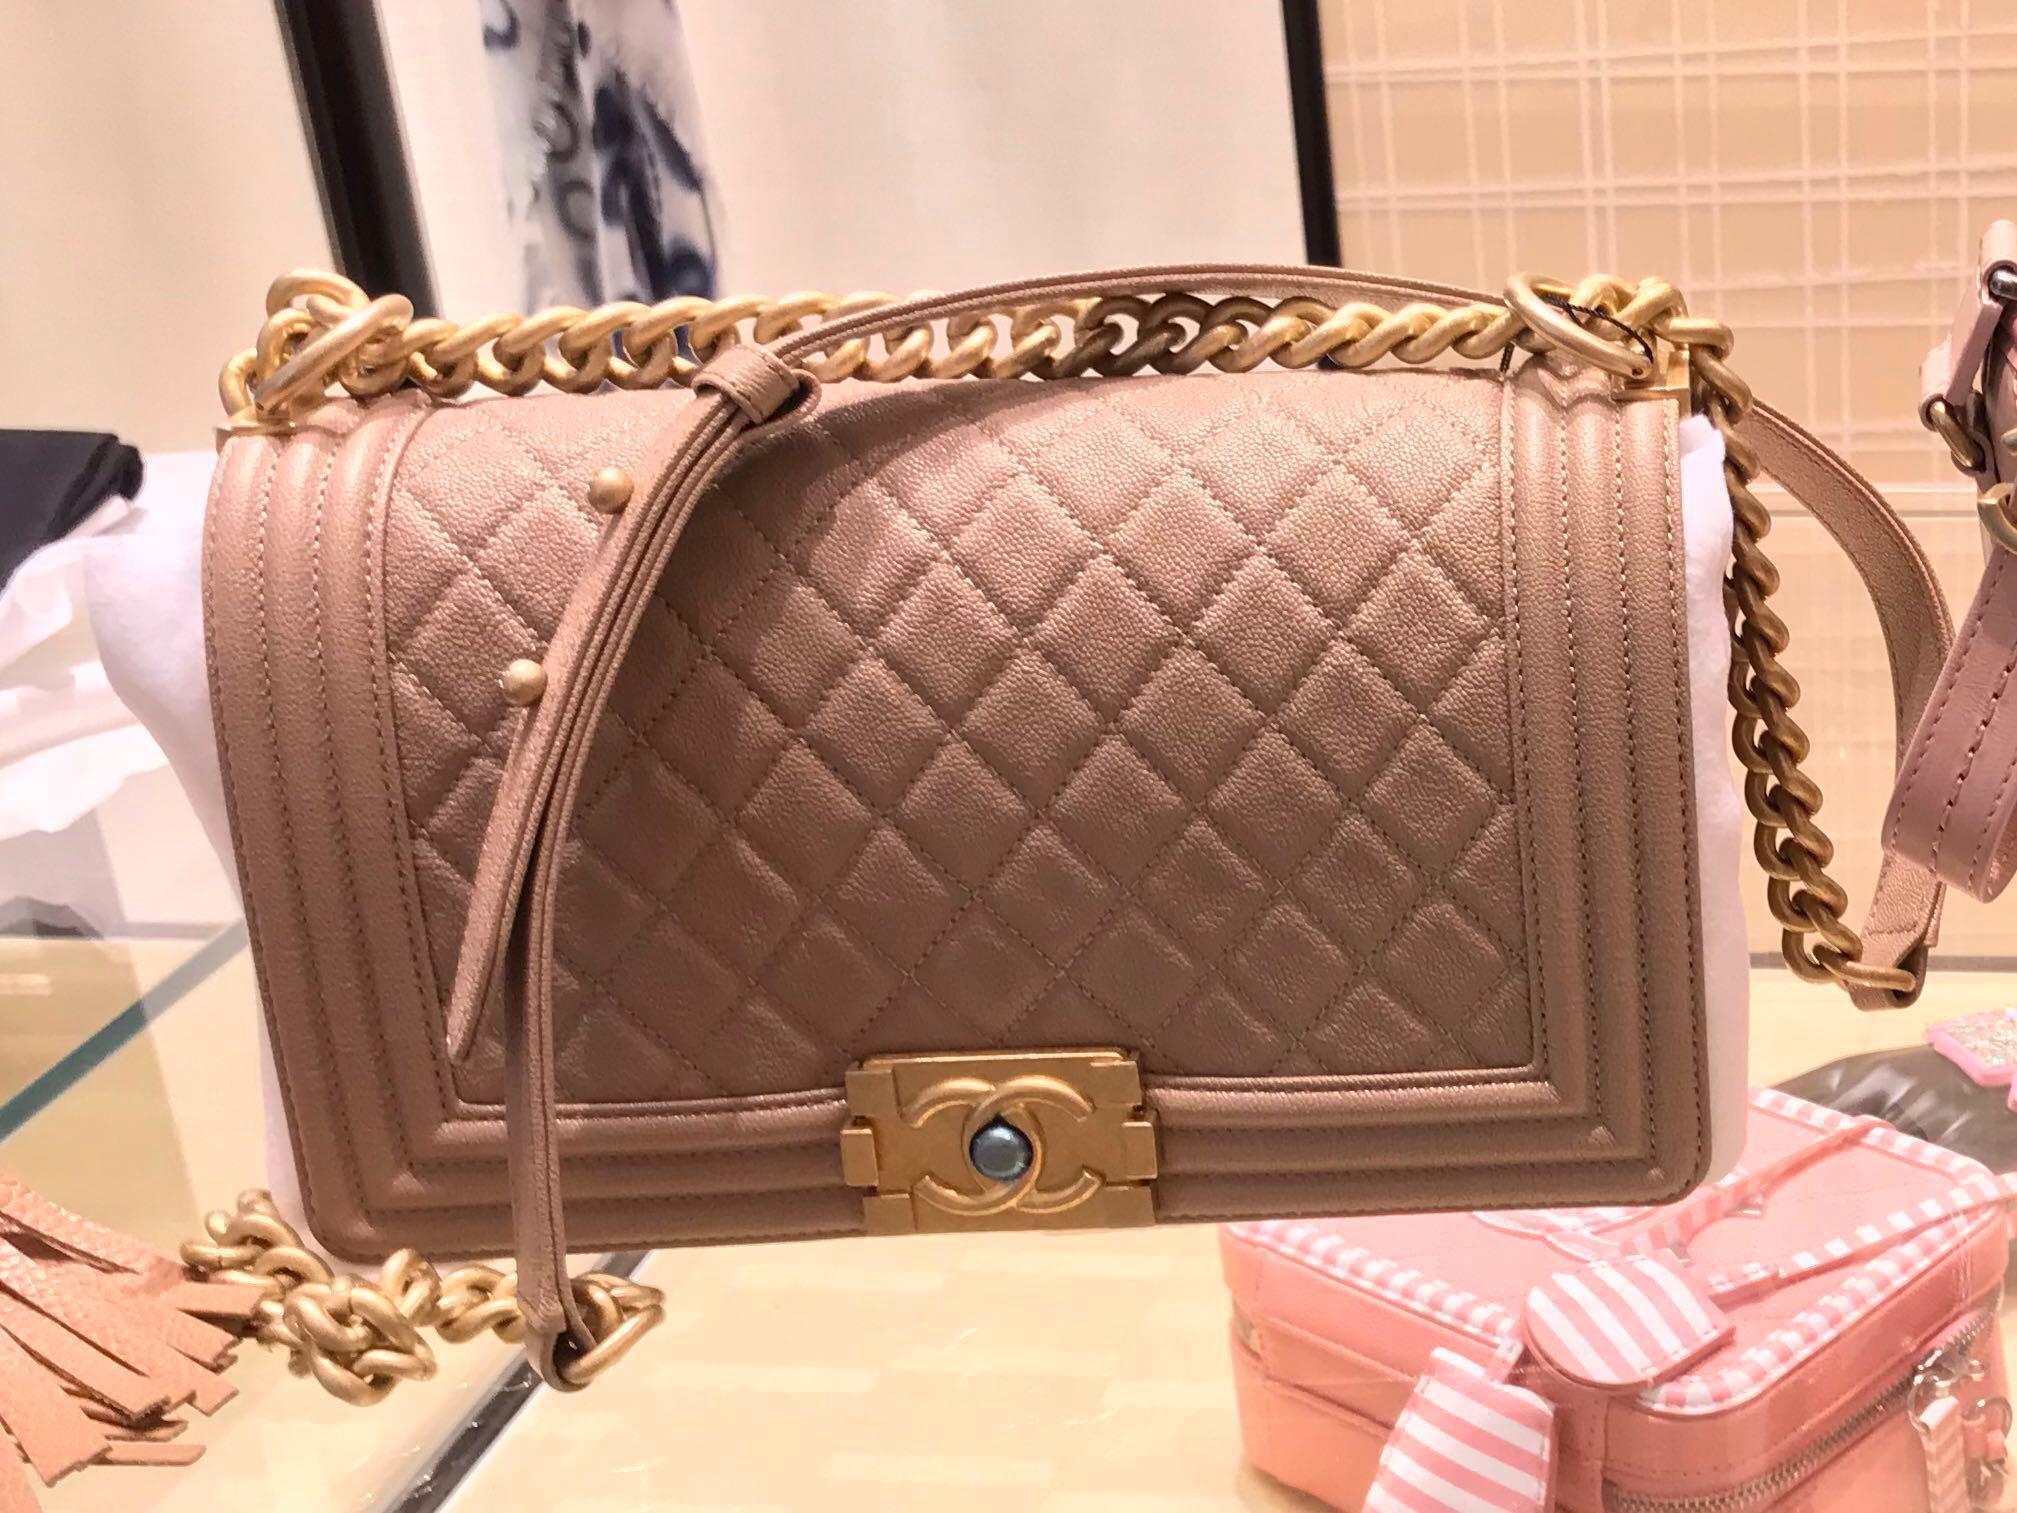 19740c0685f0 BN Authentic Chanel Nude Beige Boy Medium, Luxury, Bags & Wallets, Handbags  on Carousell